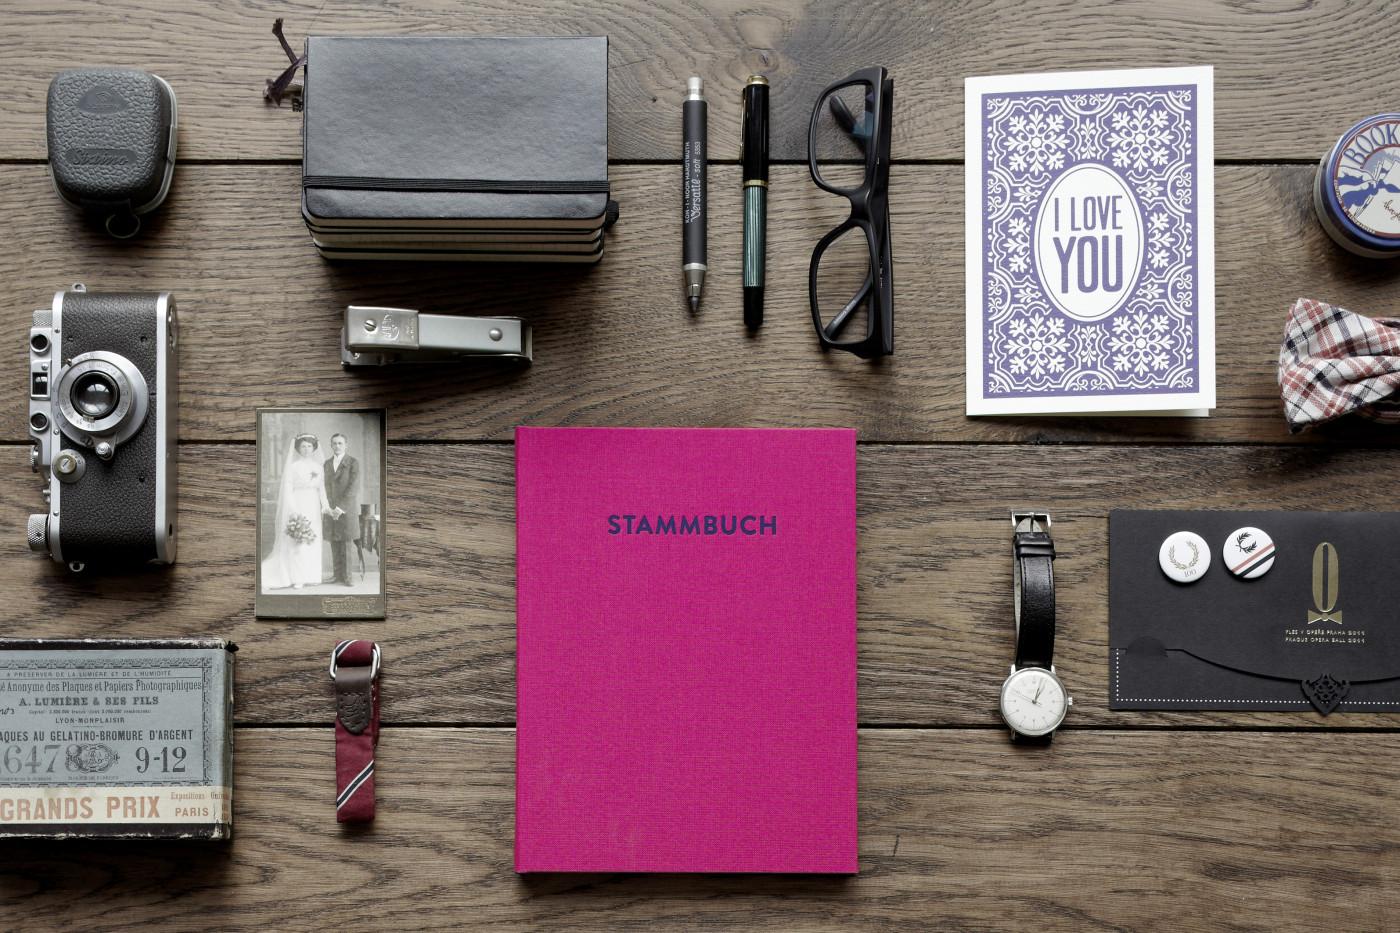 stammbuch. Black Bedroom Furniture Sets. Home Design Ideas